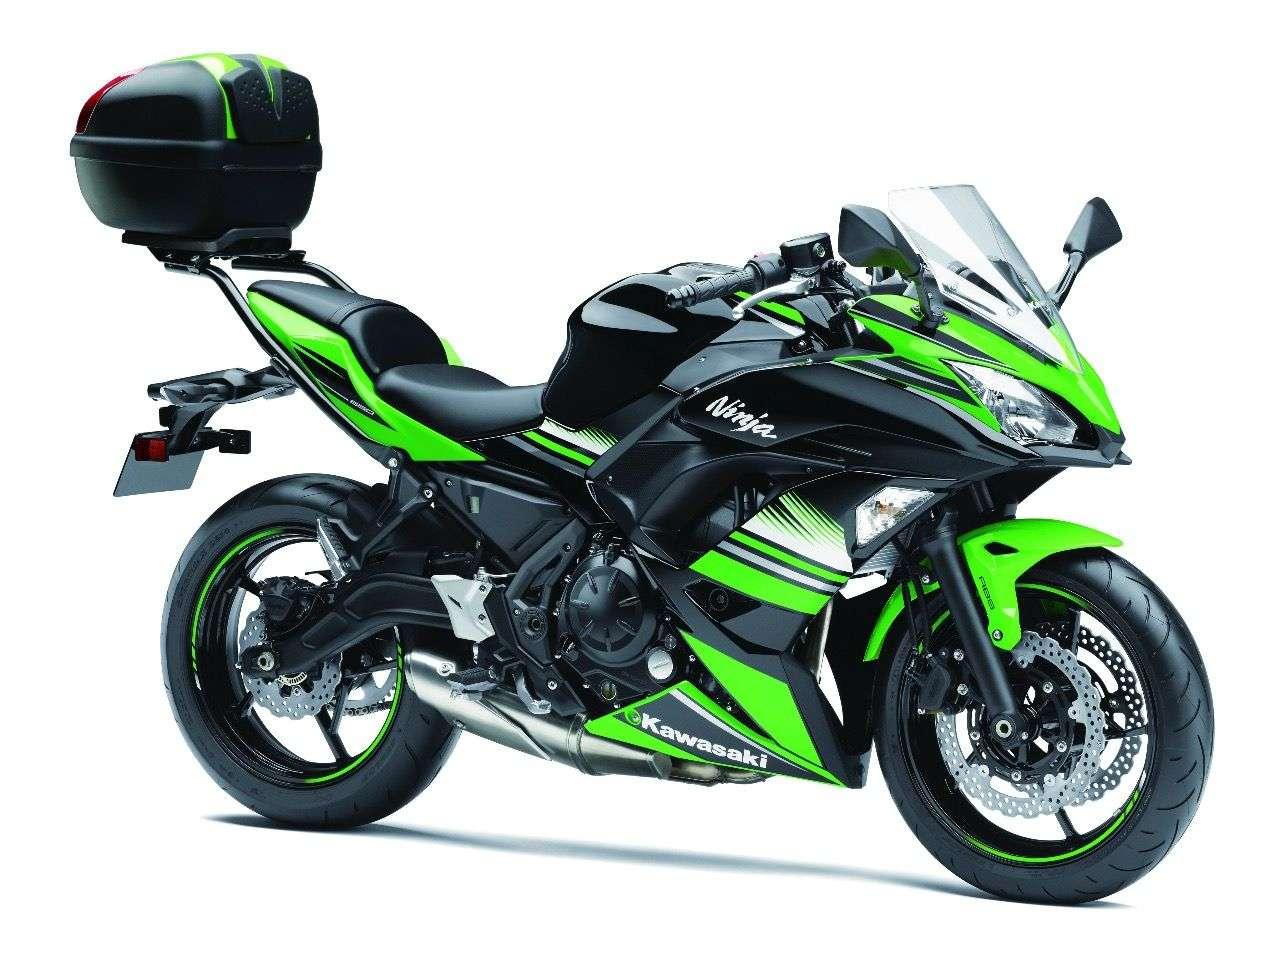 Kawasaki Ninja 650 mit optionalem 30-Liter-Topcase ...